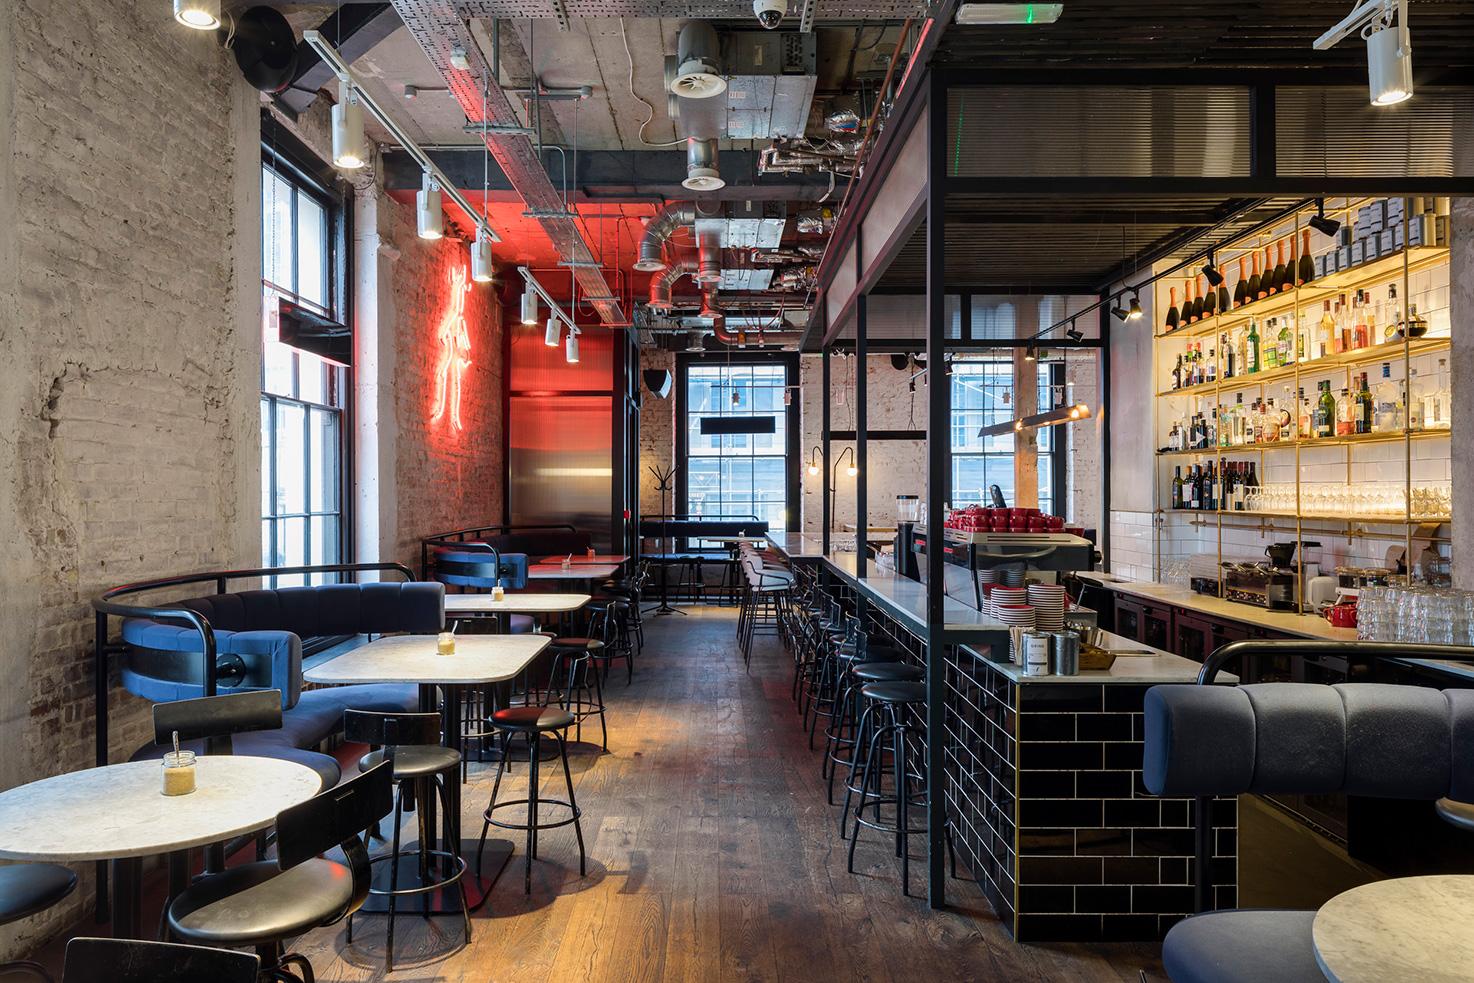 London Bridge Cafes With Wifi